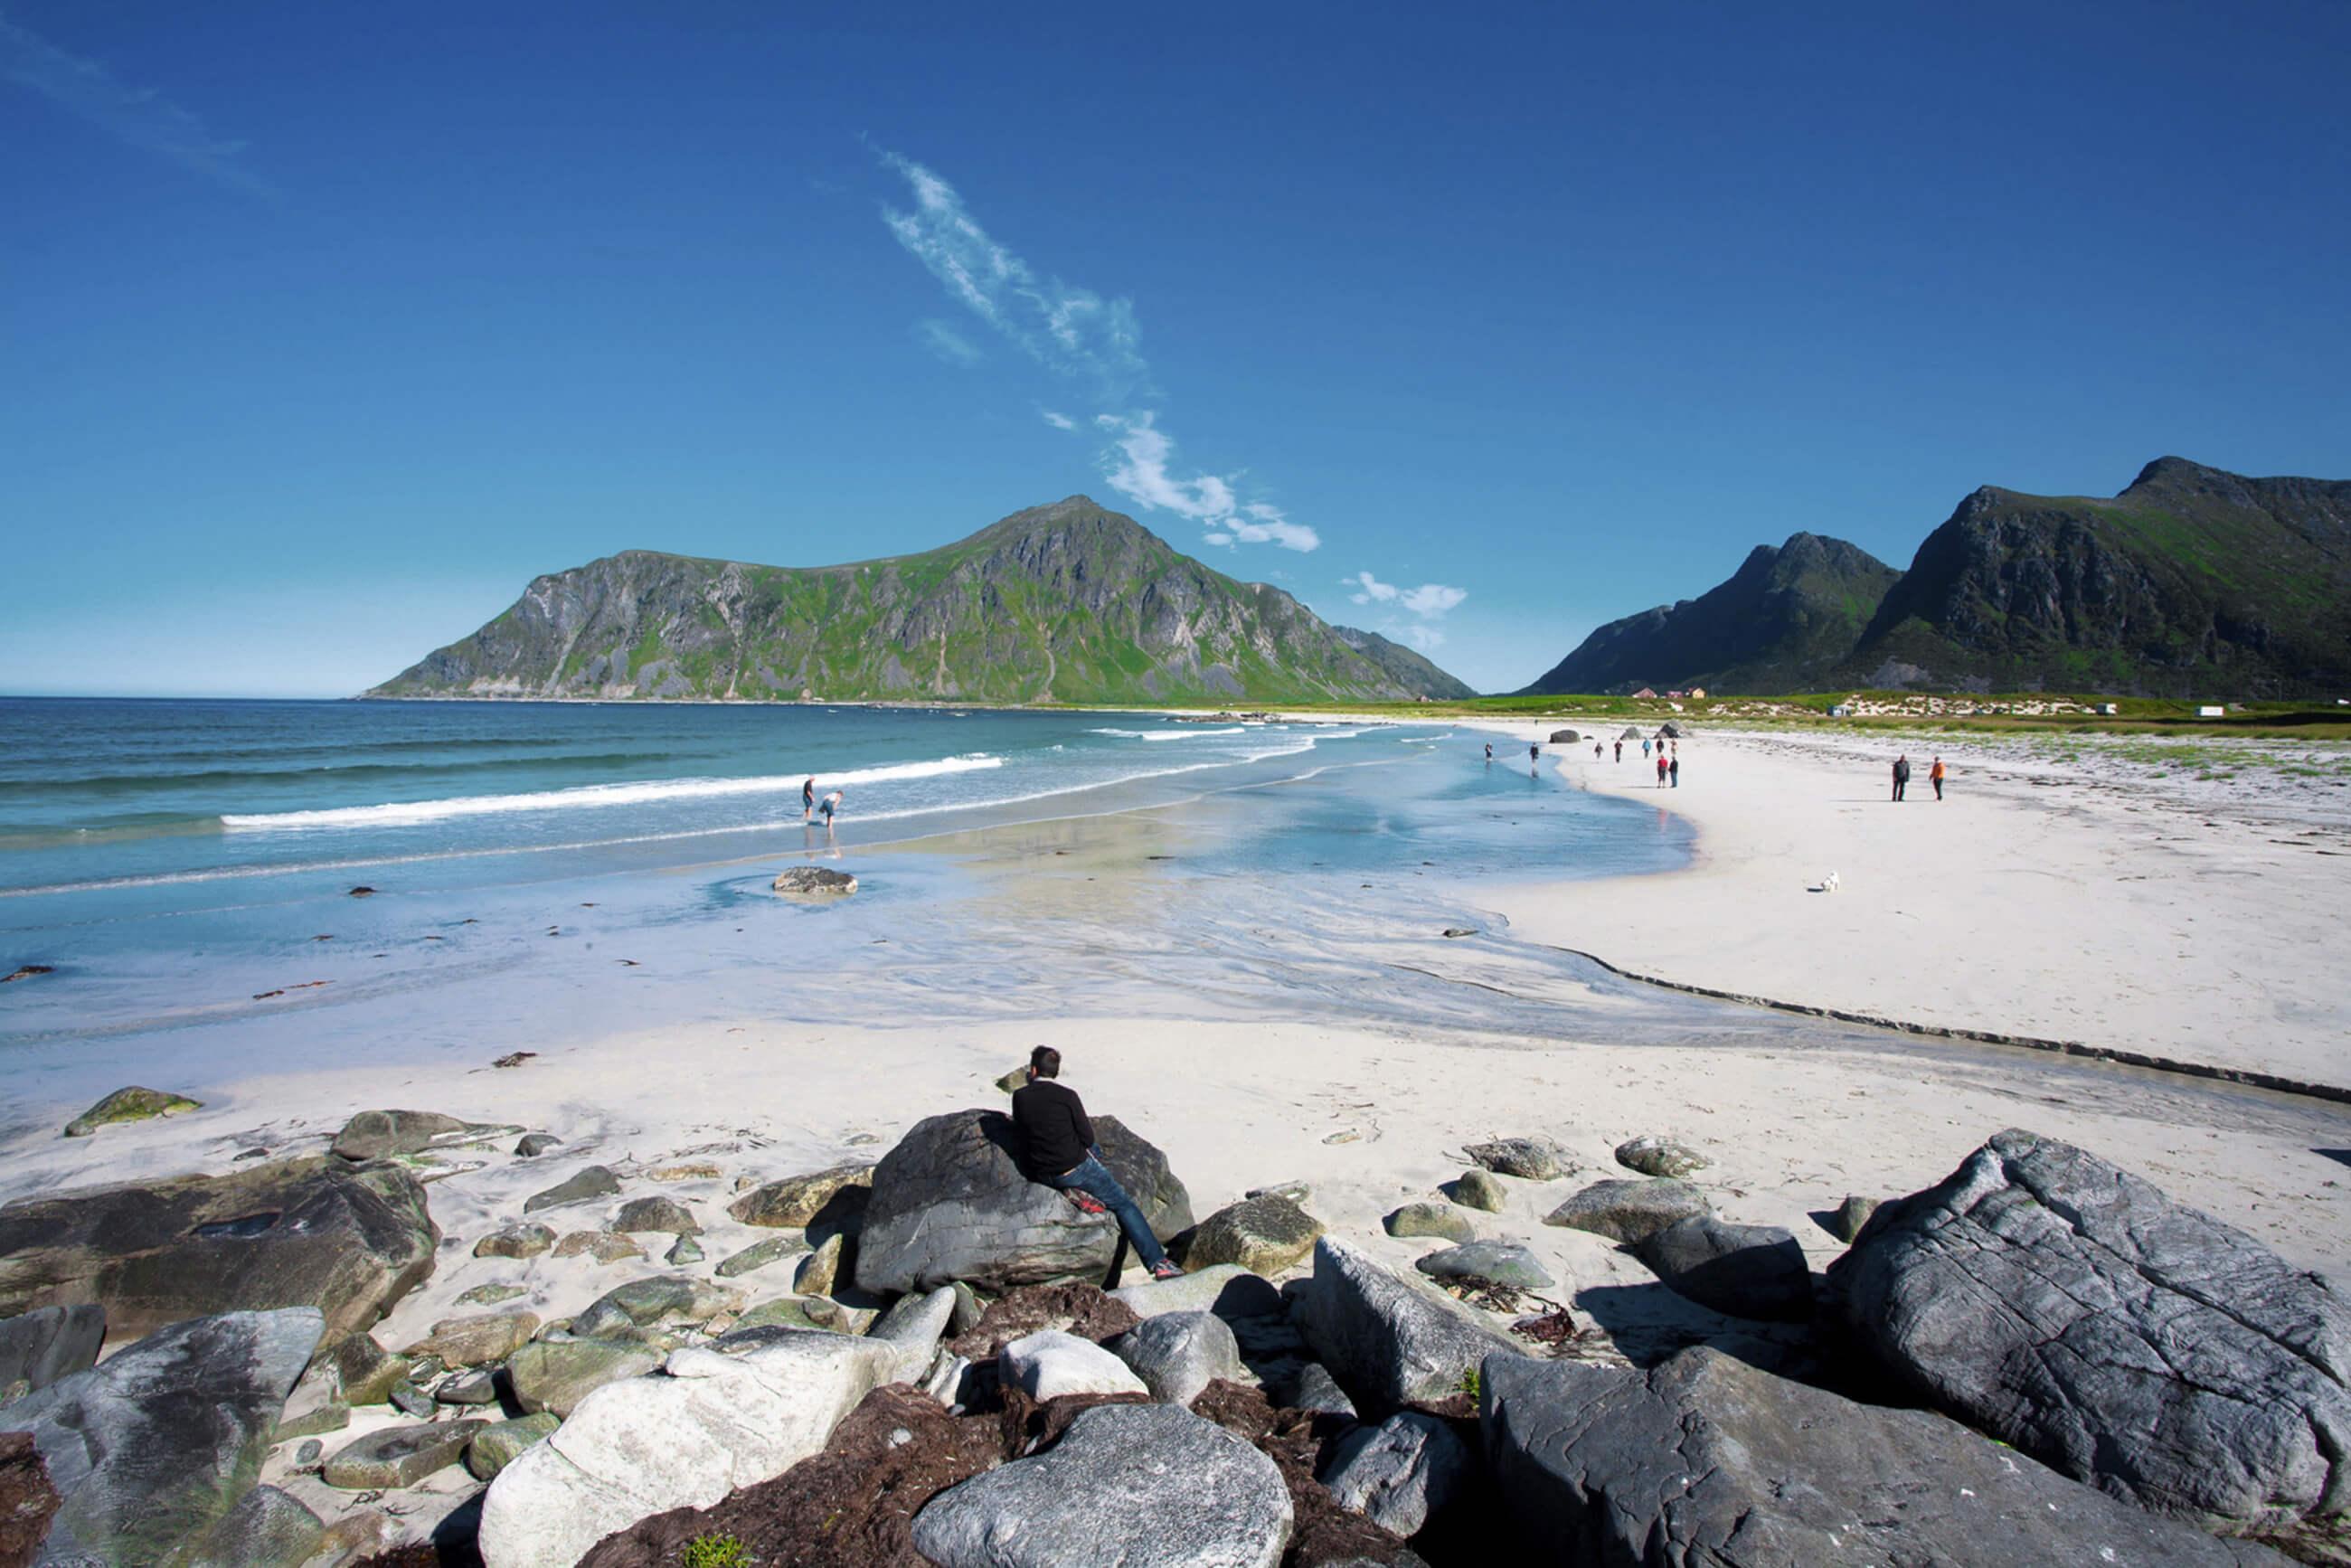 https://bubo.sk/uploads/galleries/5039/archiv_norsko_4096_plaze-severu.jpg